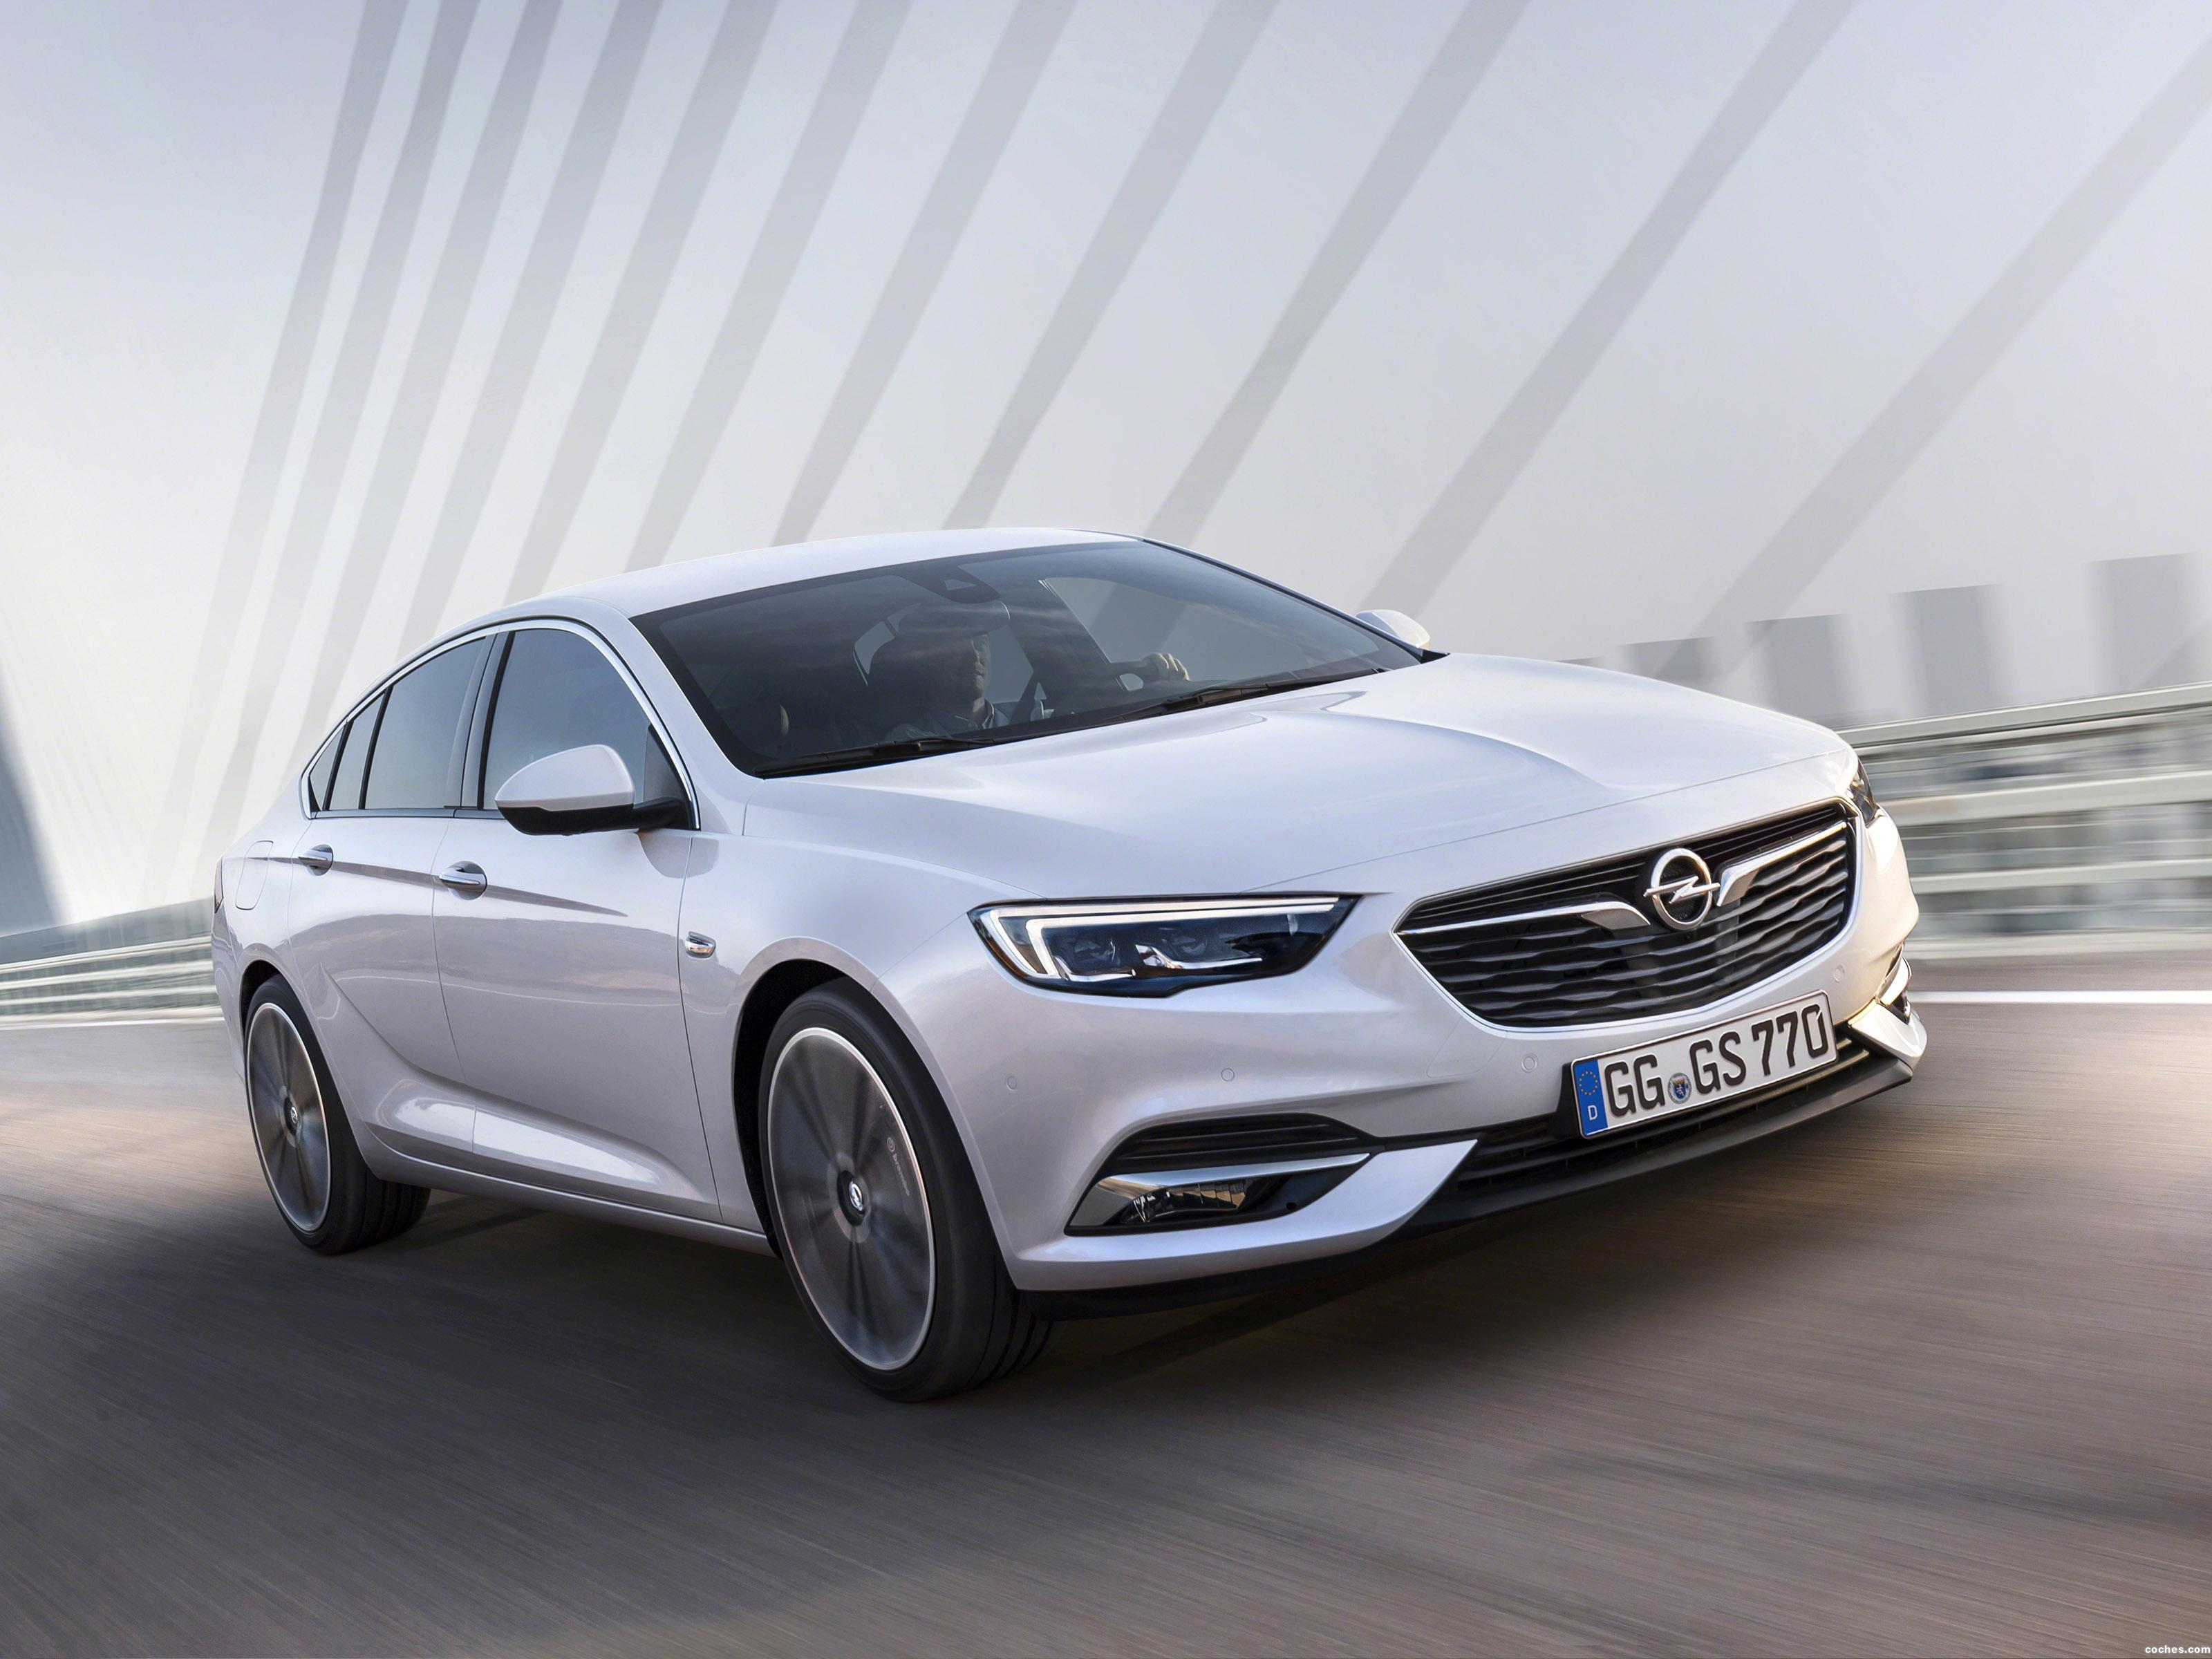 Fotos de Opel Insignia Grand Sport 2017